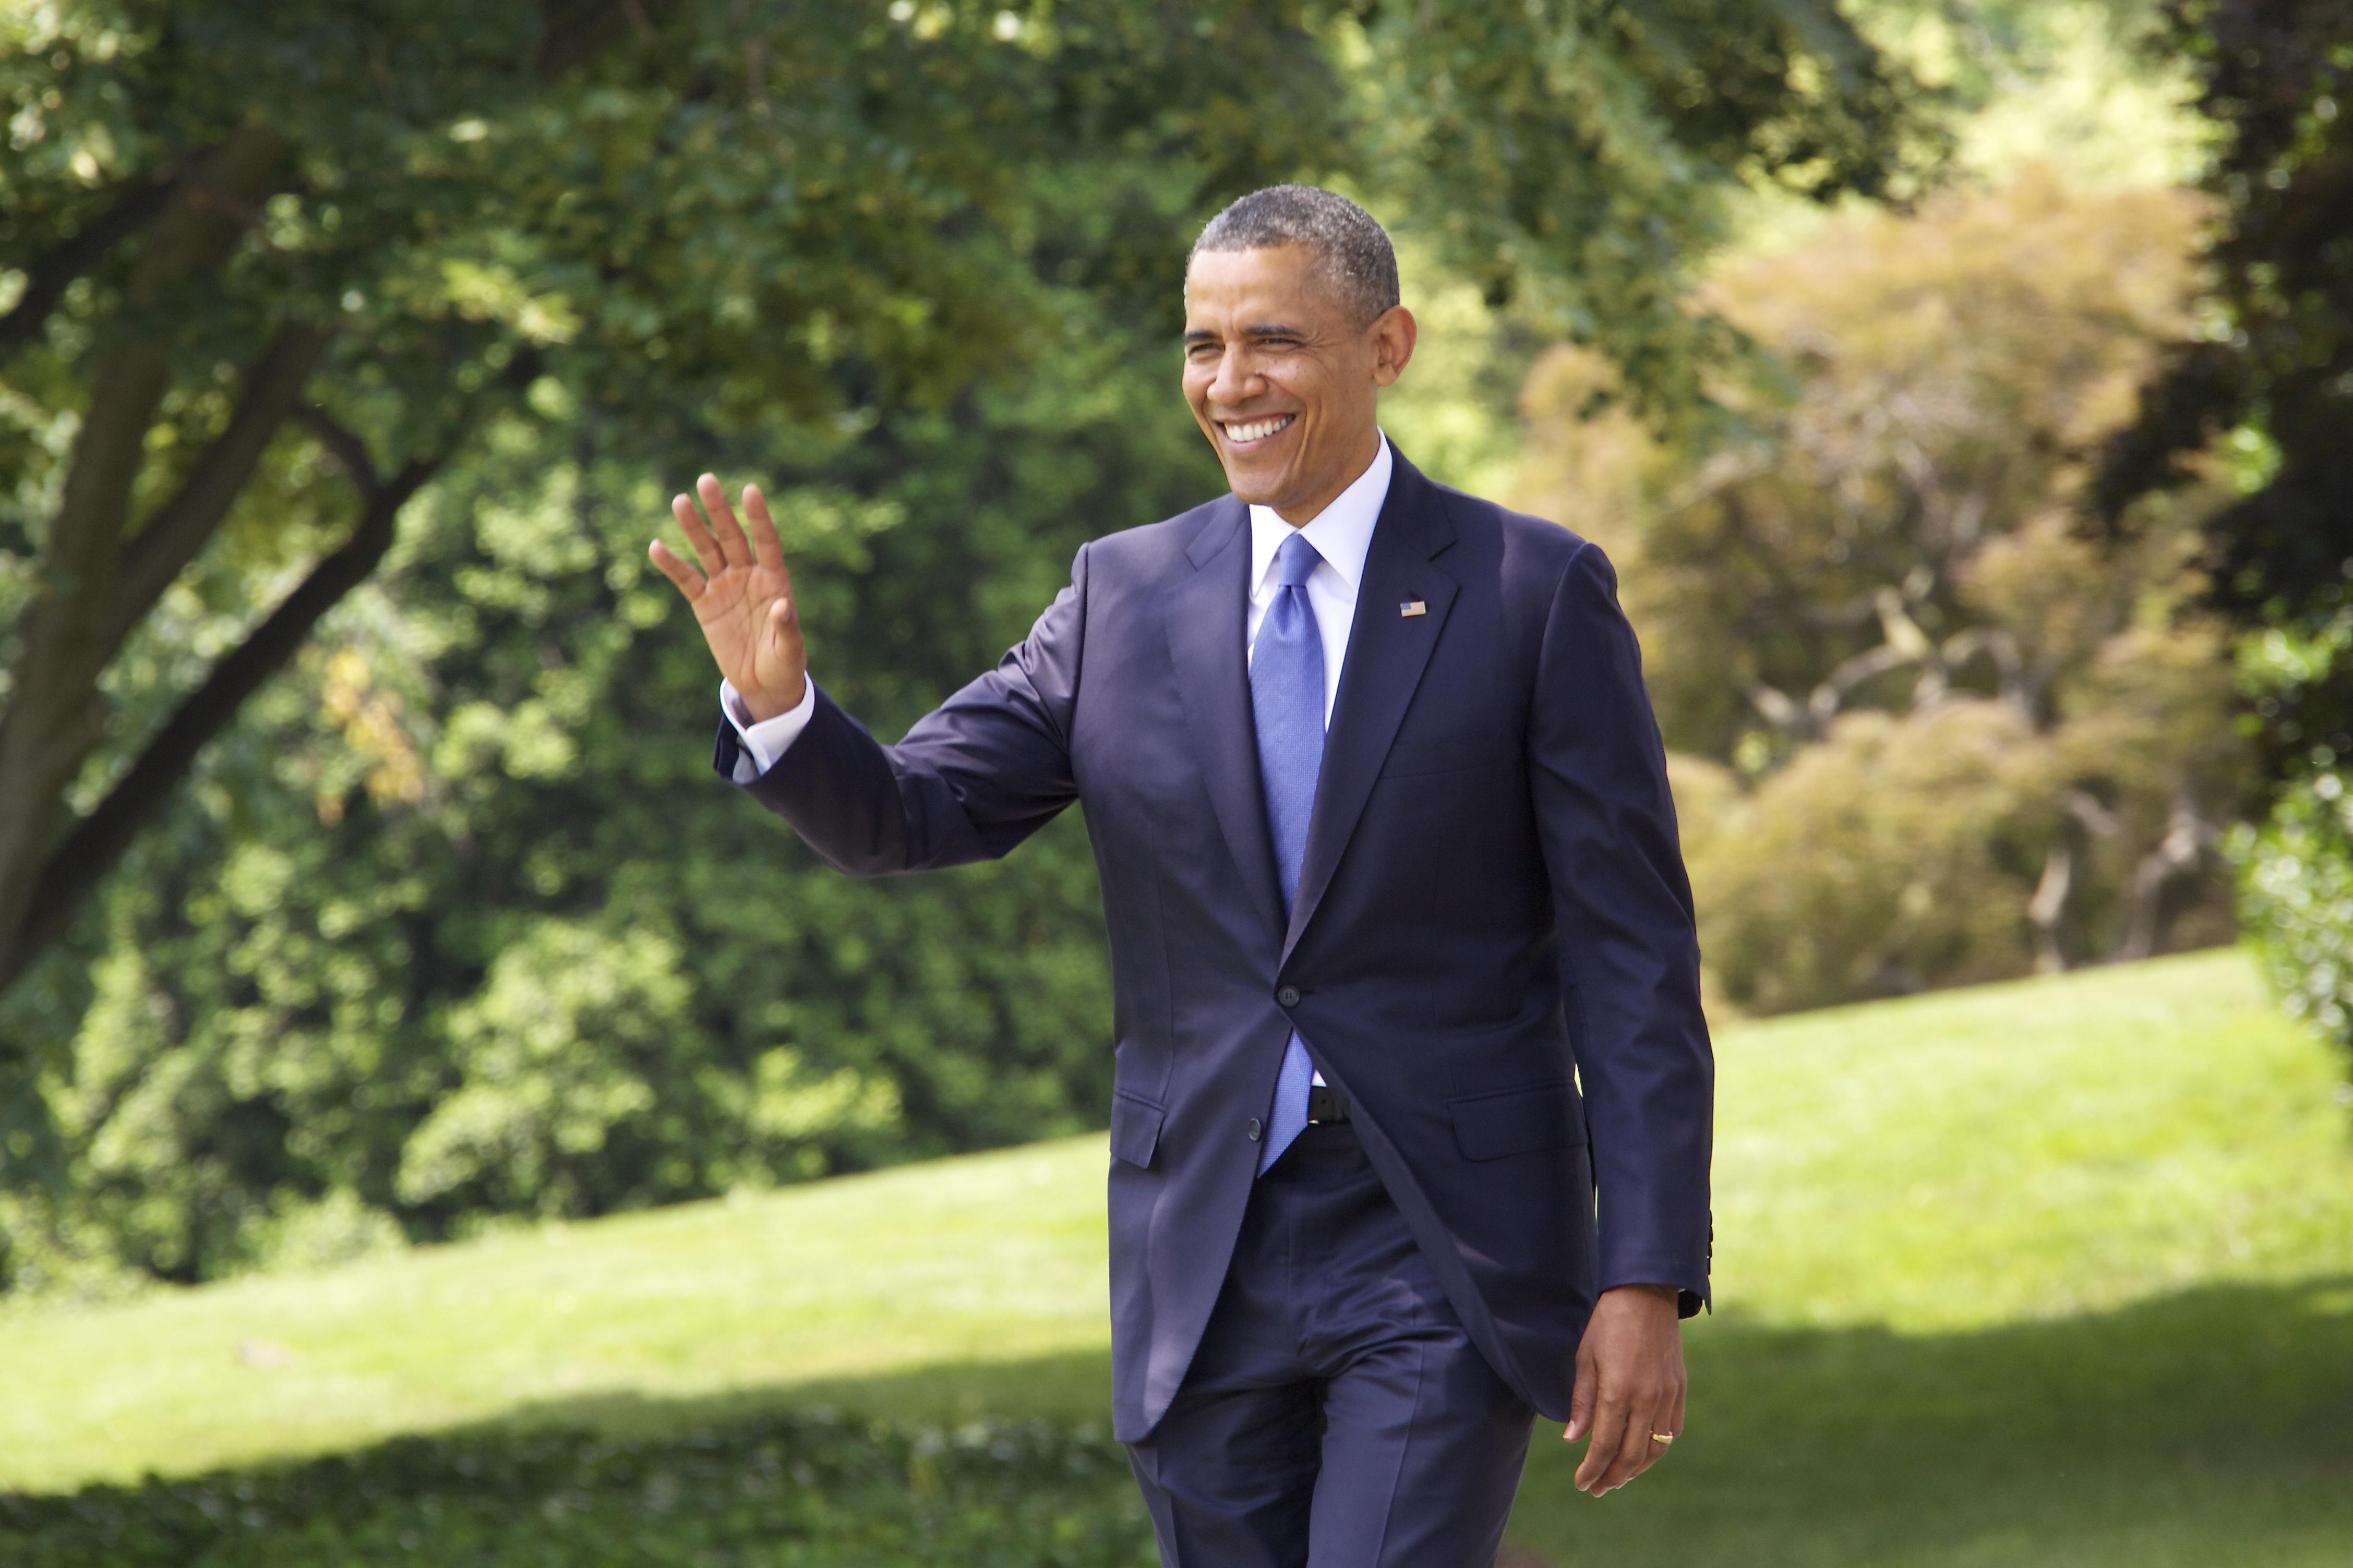 President Barack Obama waves as he walks on the White House lawn Friday, June 13, 2014.